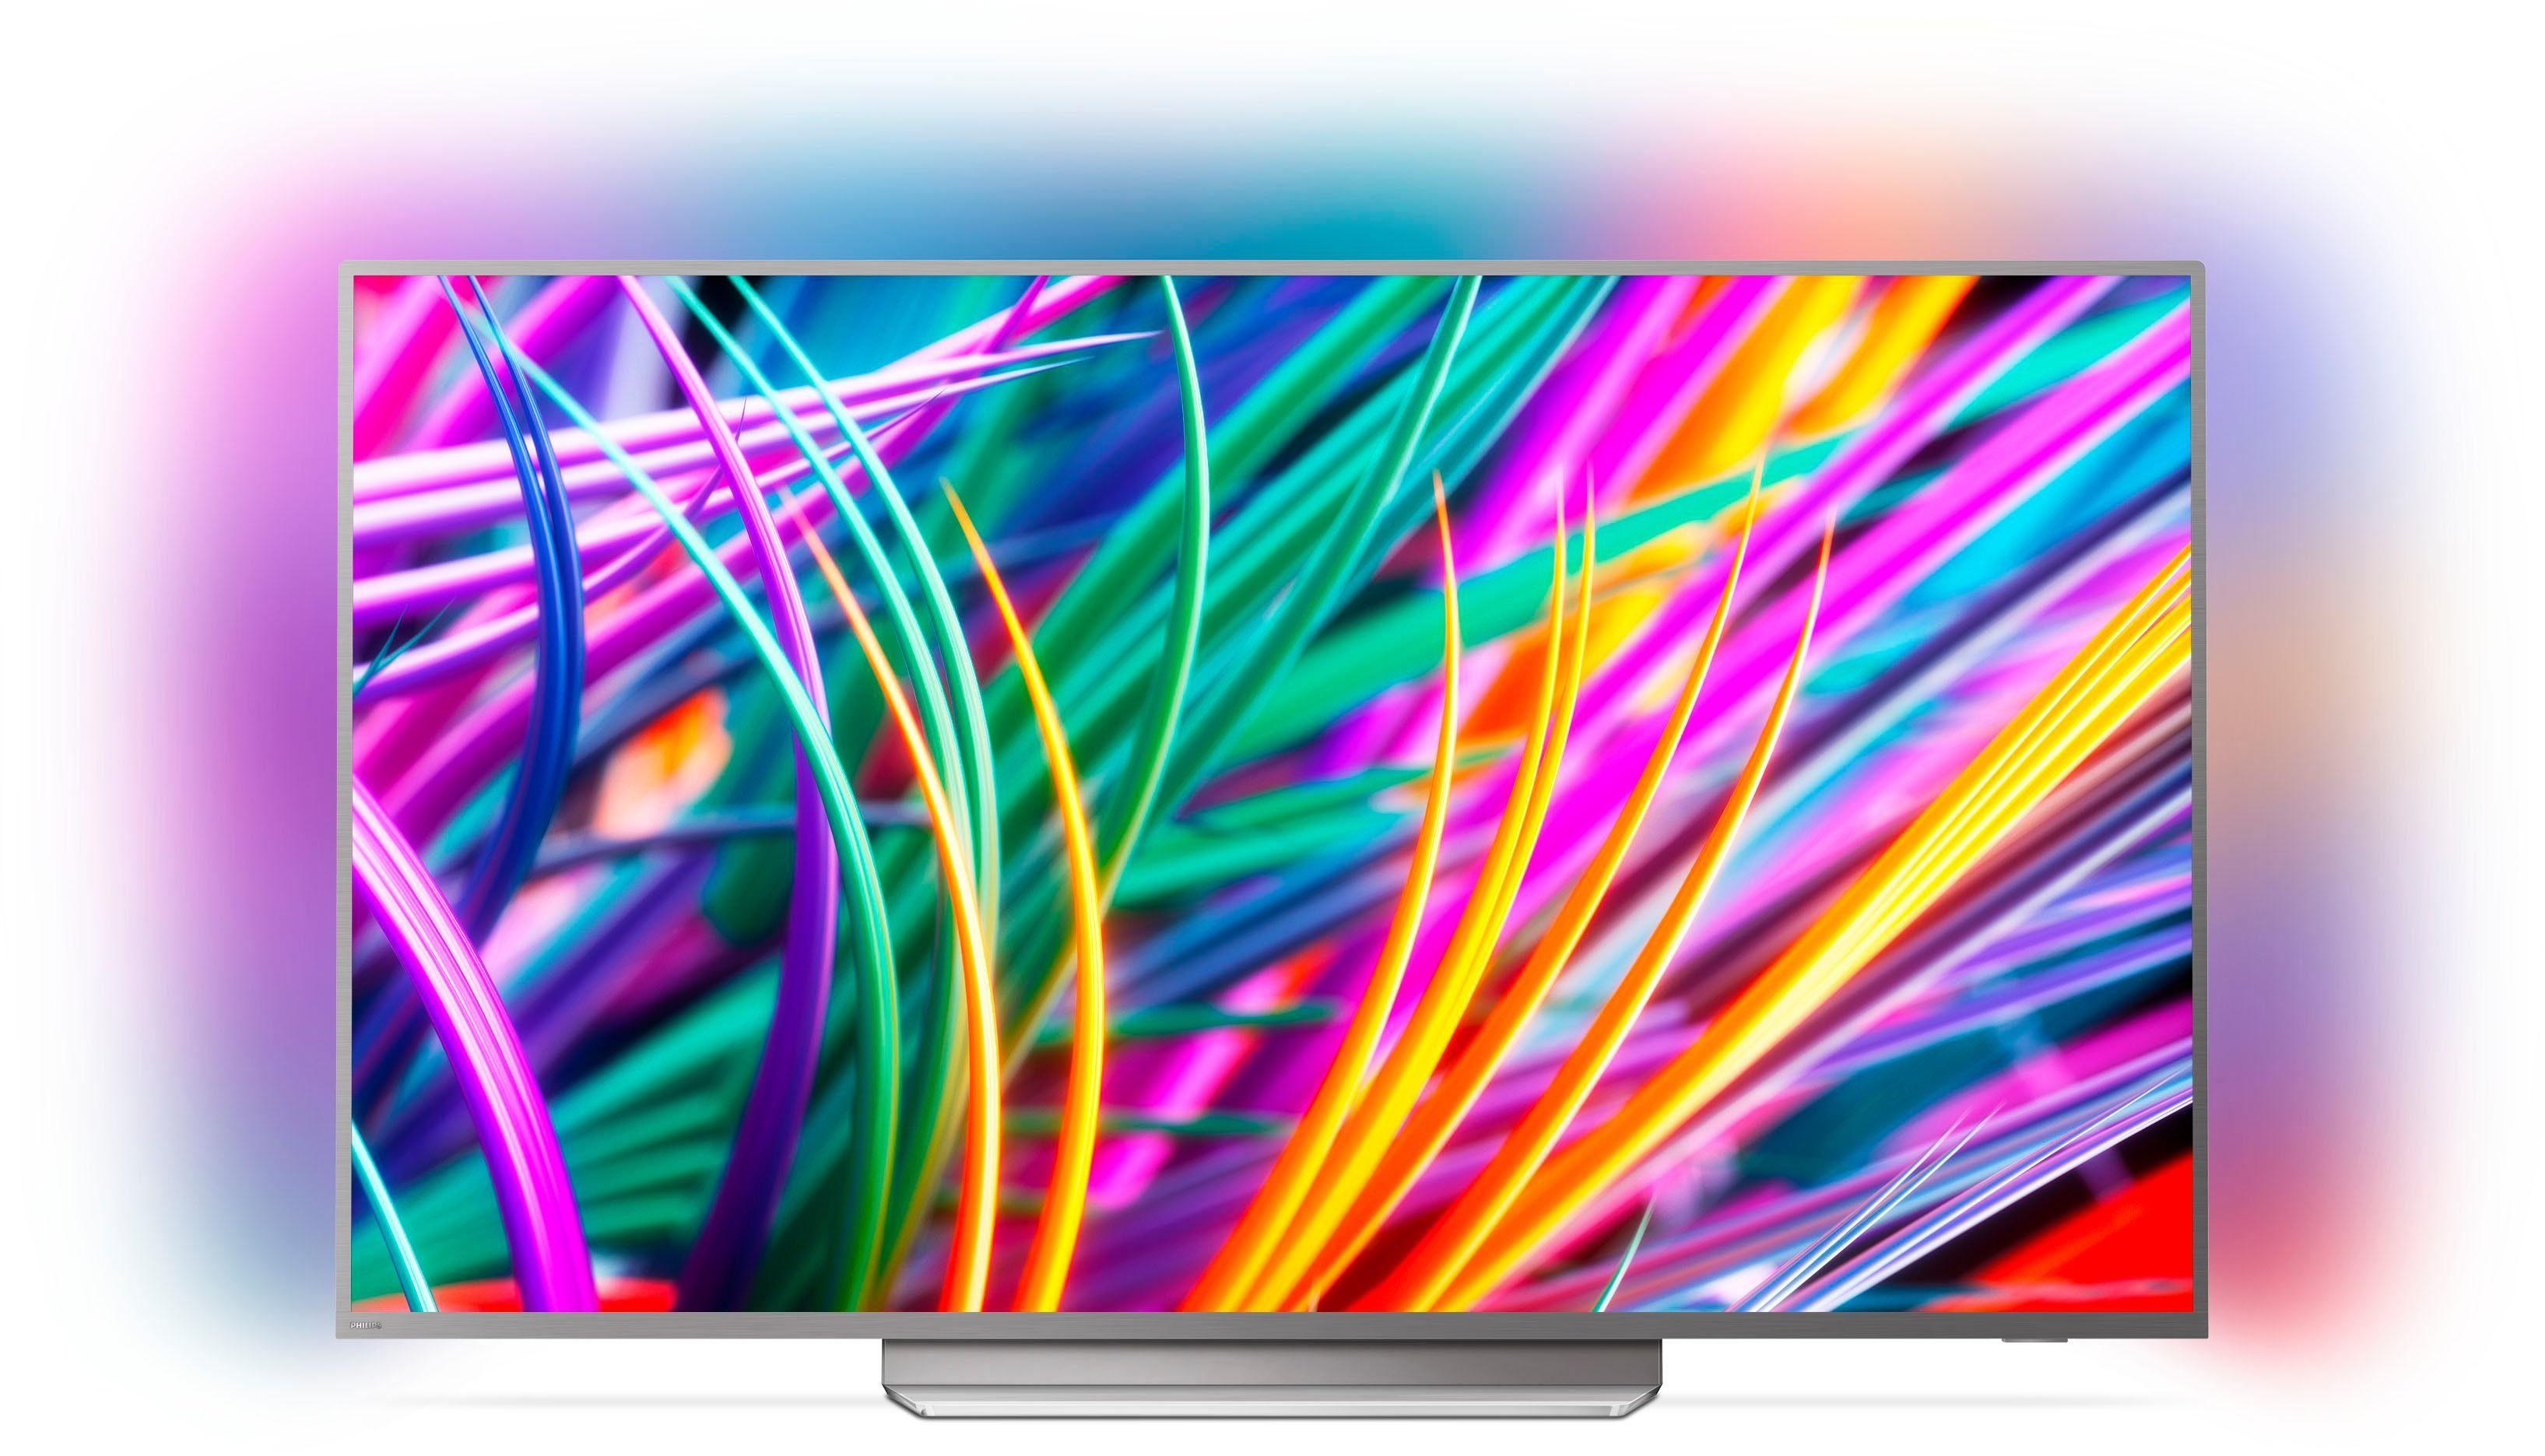 Philips 65PUS8303 LED-Fernseher (164 cm/65 Zoll, 4K Ultra HD, Smart-TV, USB-Recording)